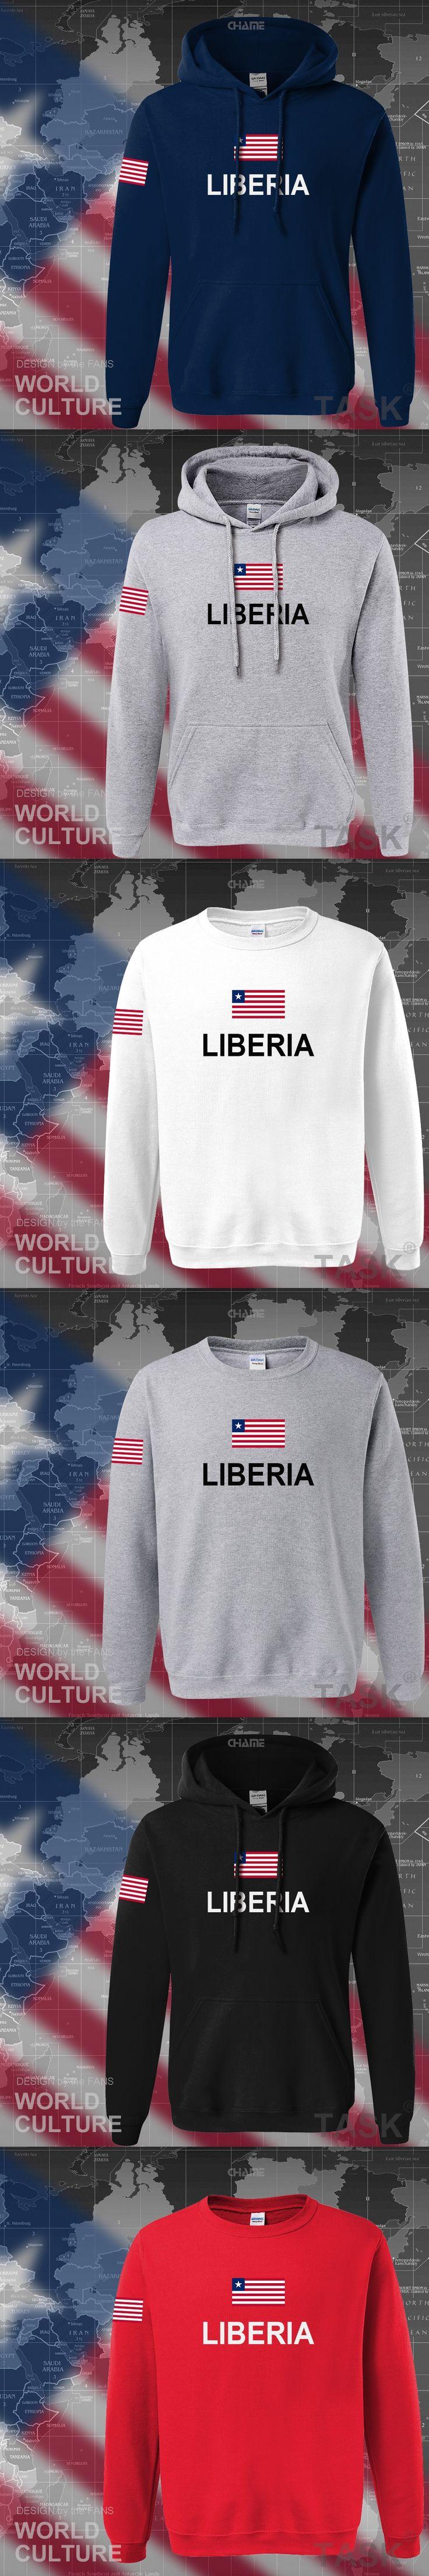 Liberia Liberian hoodies men sweatshirt polo sweat new hip hop streetwear flag nation team country tracksuit nation 2017 LR LBR